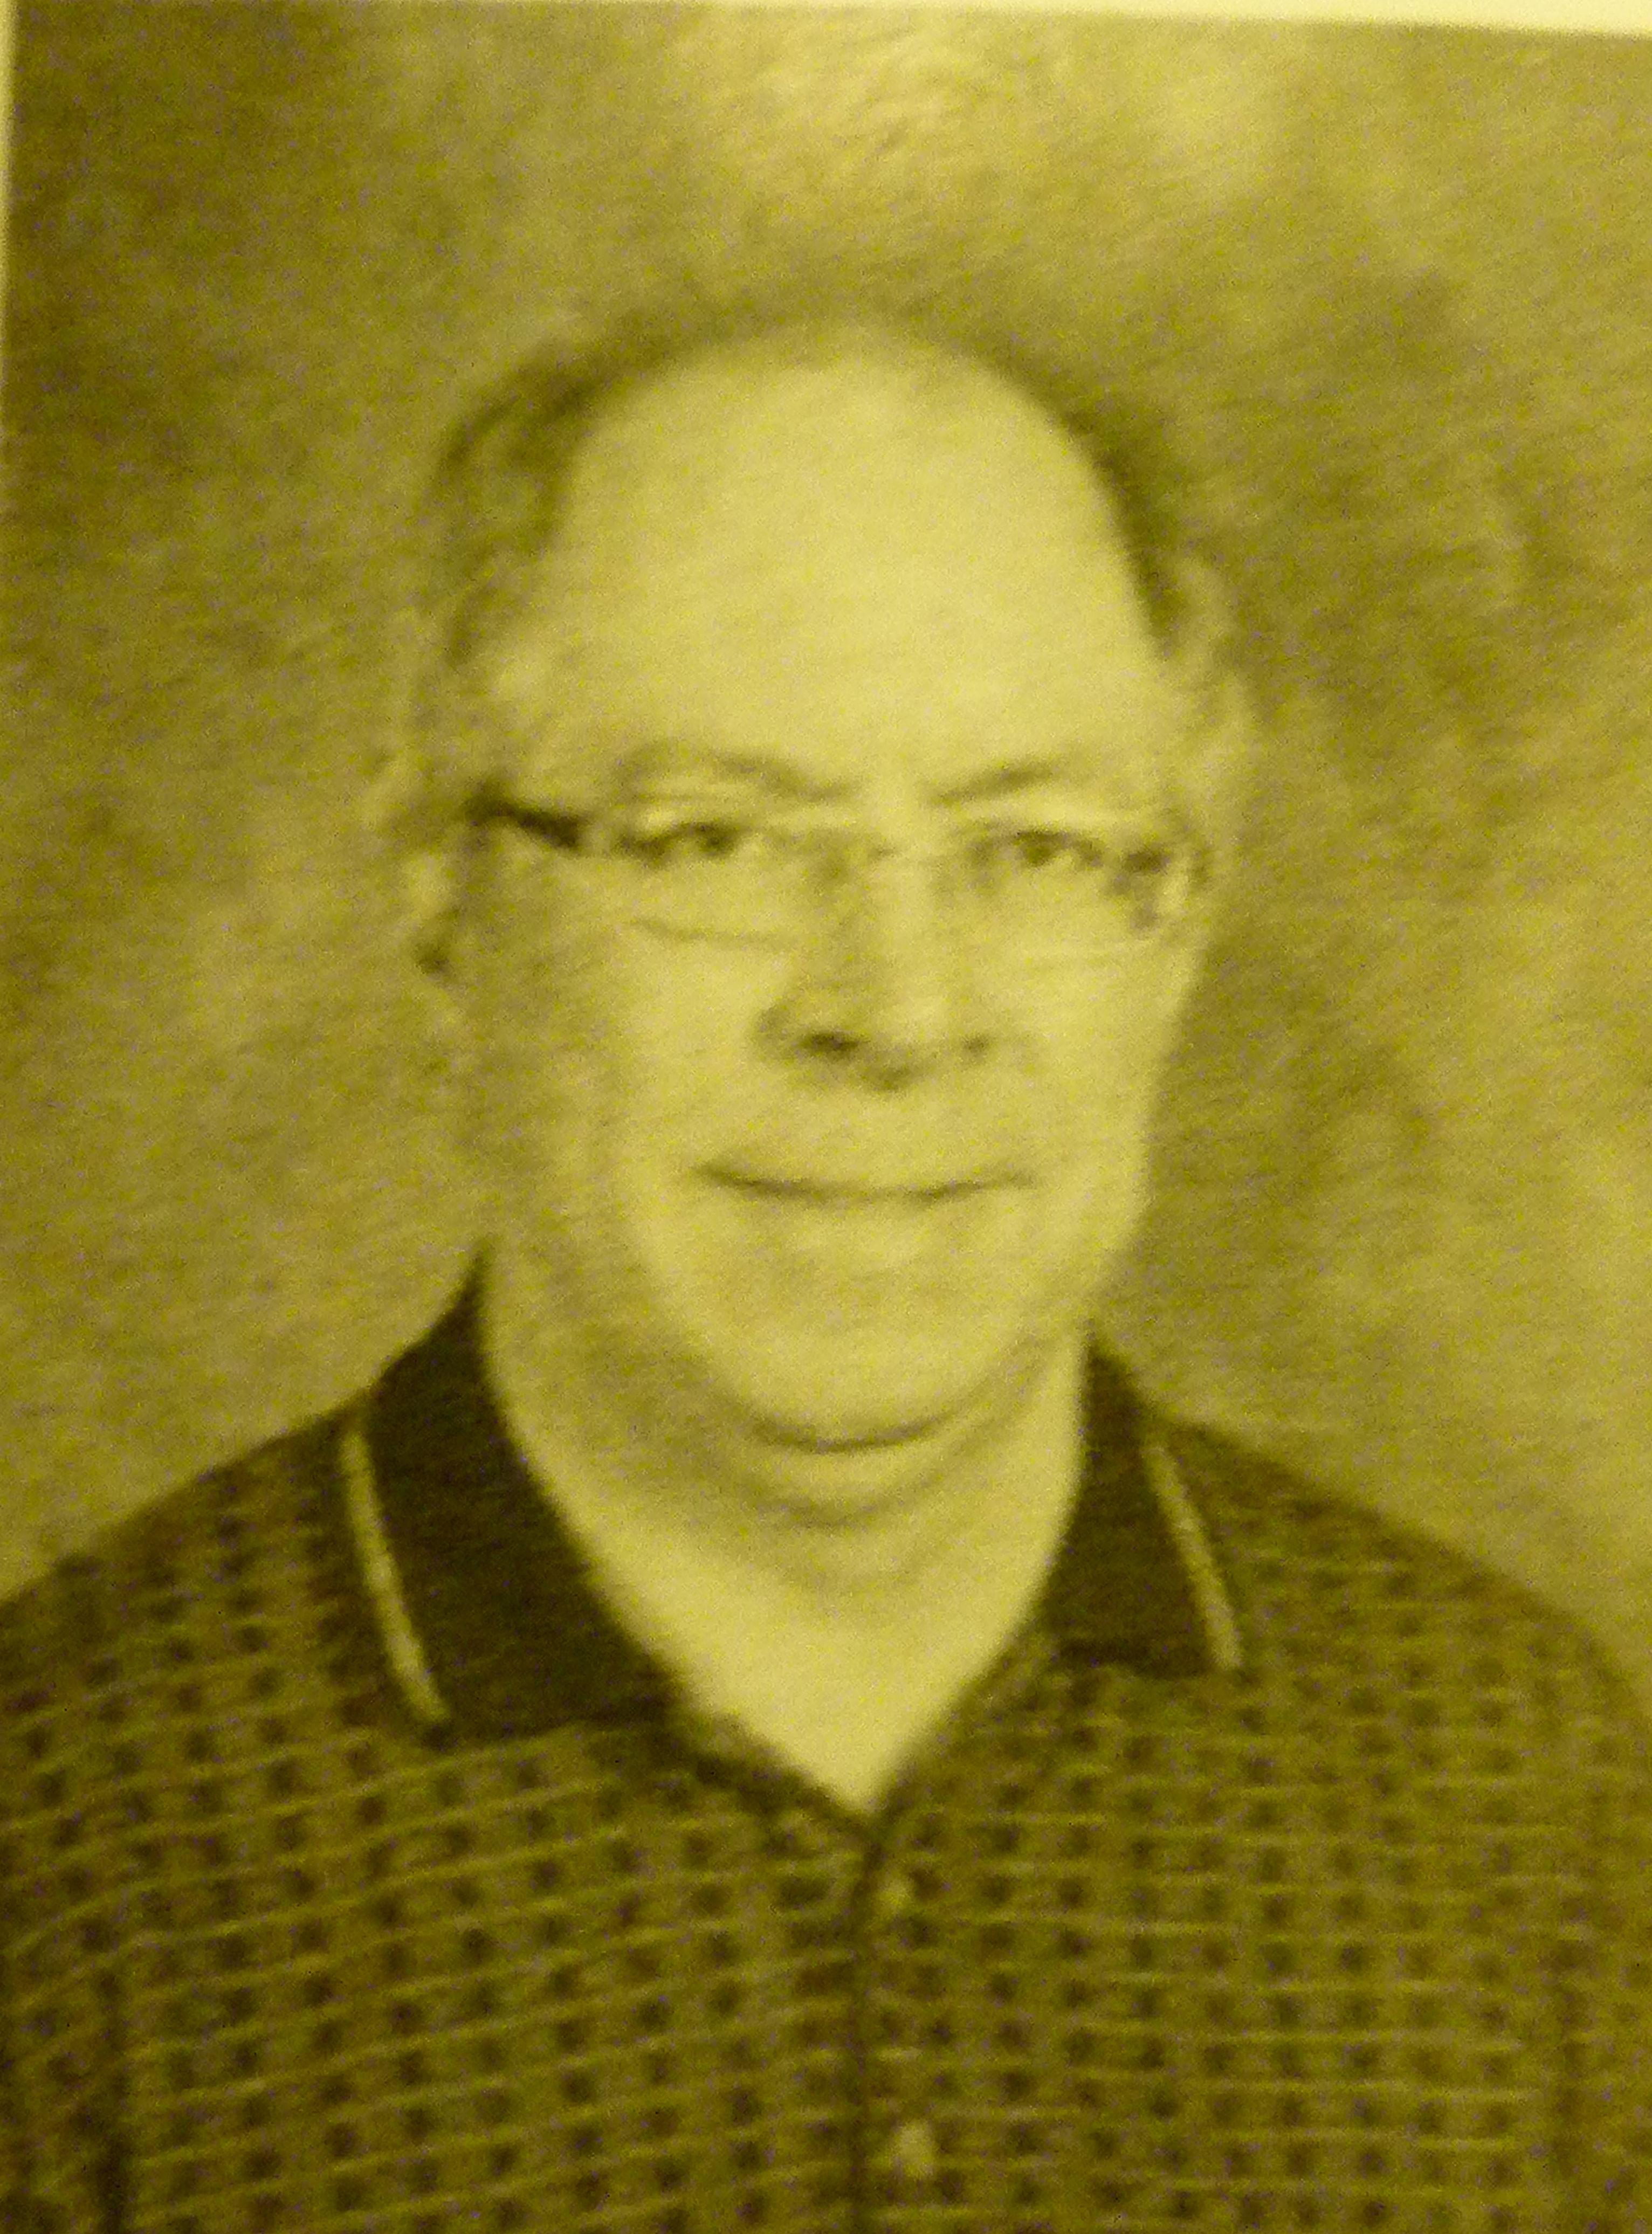 Greg Eldred, Coudersport School District music teacher and alleged shooter